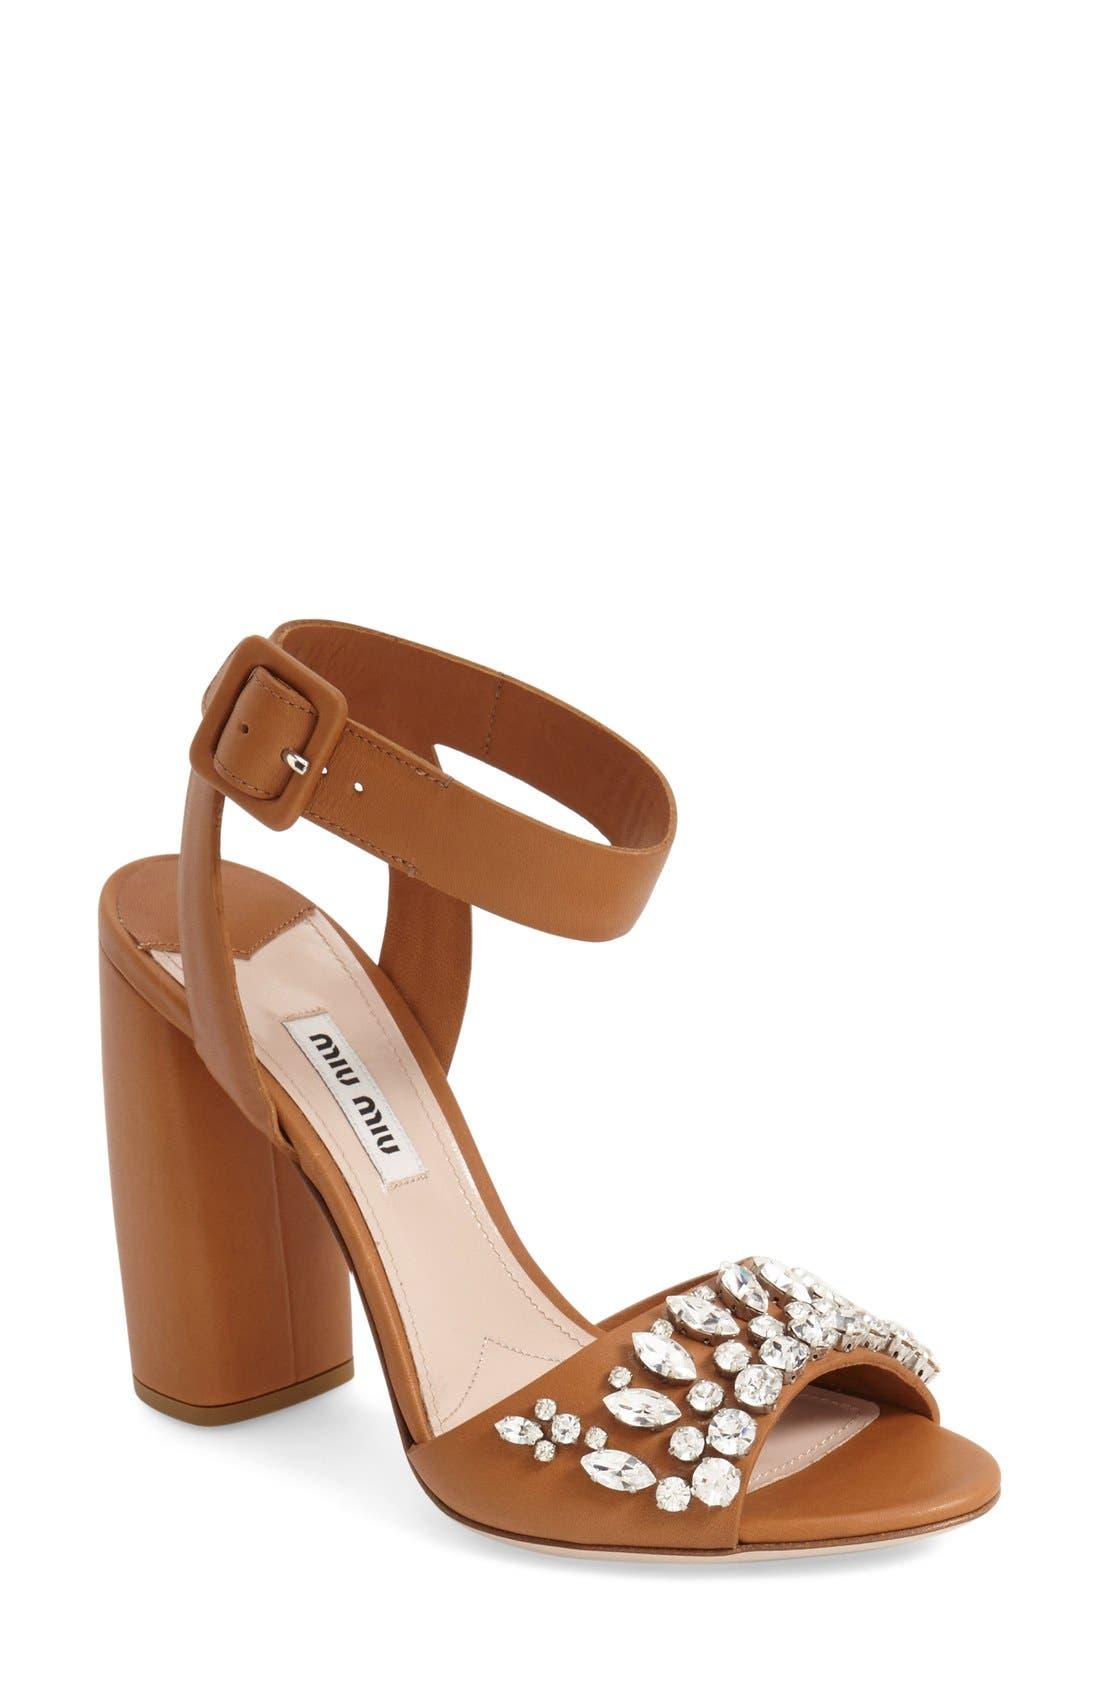 Main Image - Miu Miu 'Jewel' Sandal (Women)